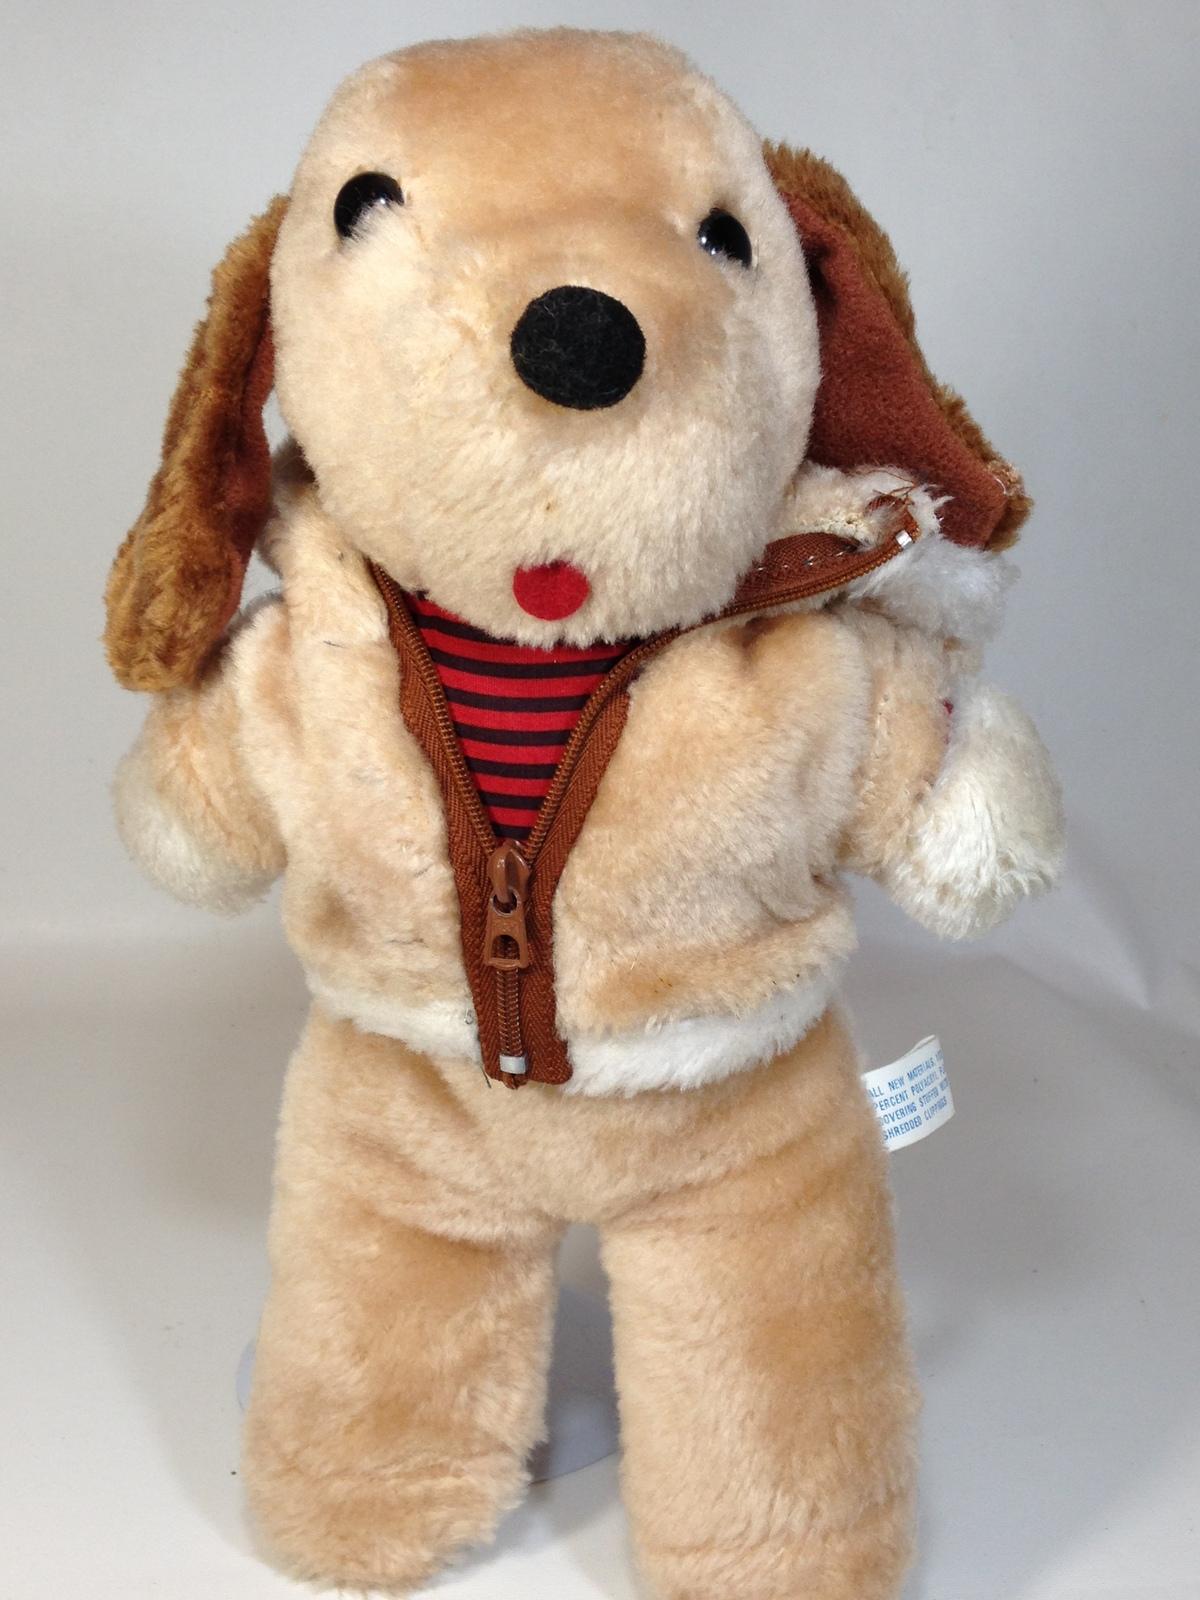 c64e7eb5aef0e6 Vintage interpur plush dog brown stuffed animal puppy zip up jacket hoodie  12 1